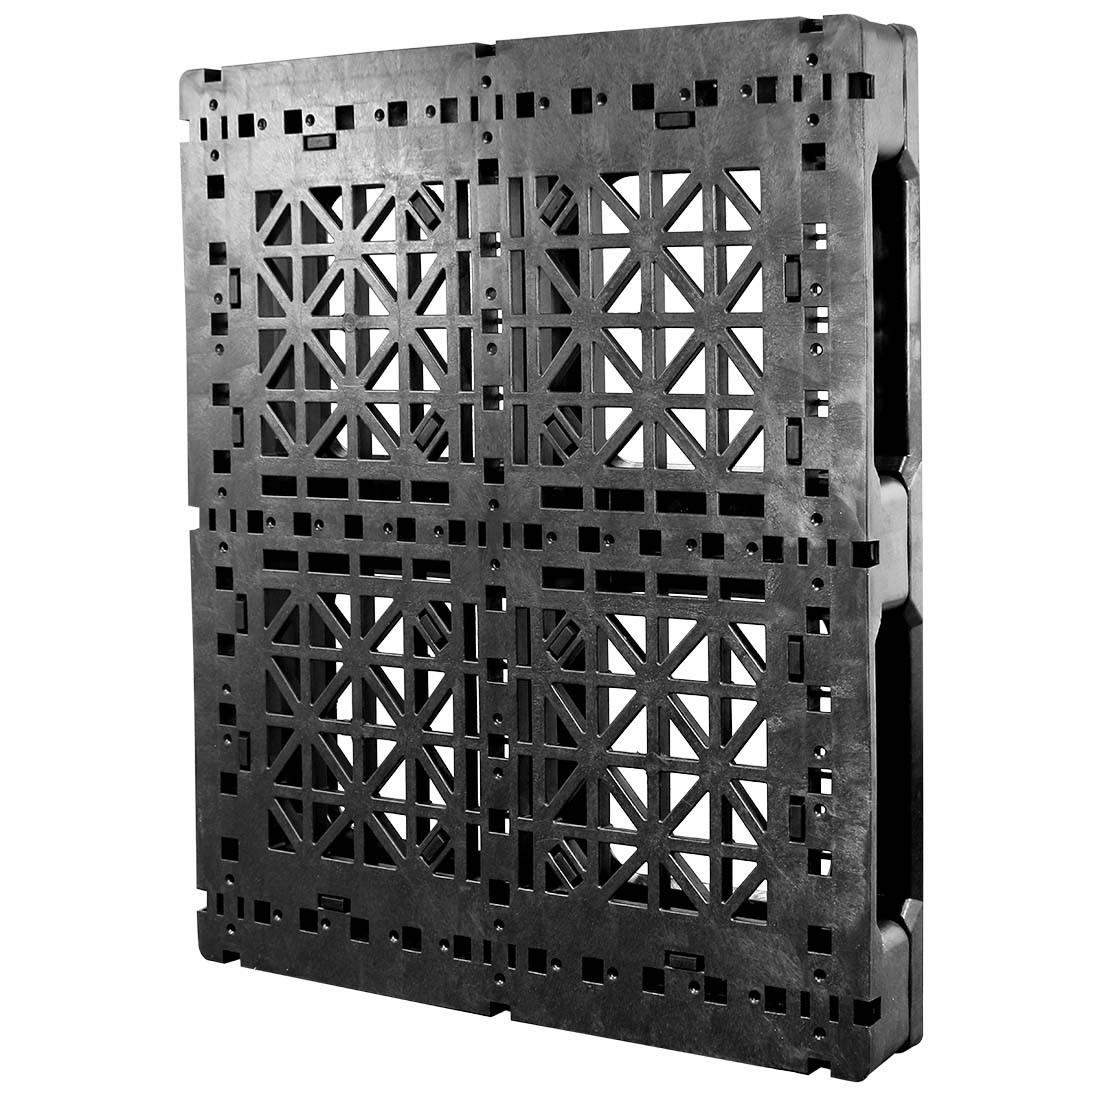 Fire Resistant Reinforcement : Heavy duty rackable plastic pallet w fiberglass